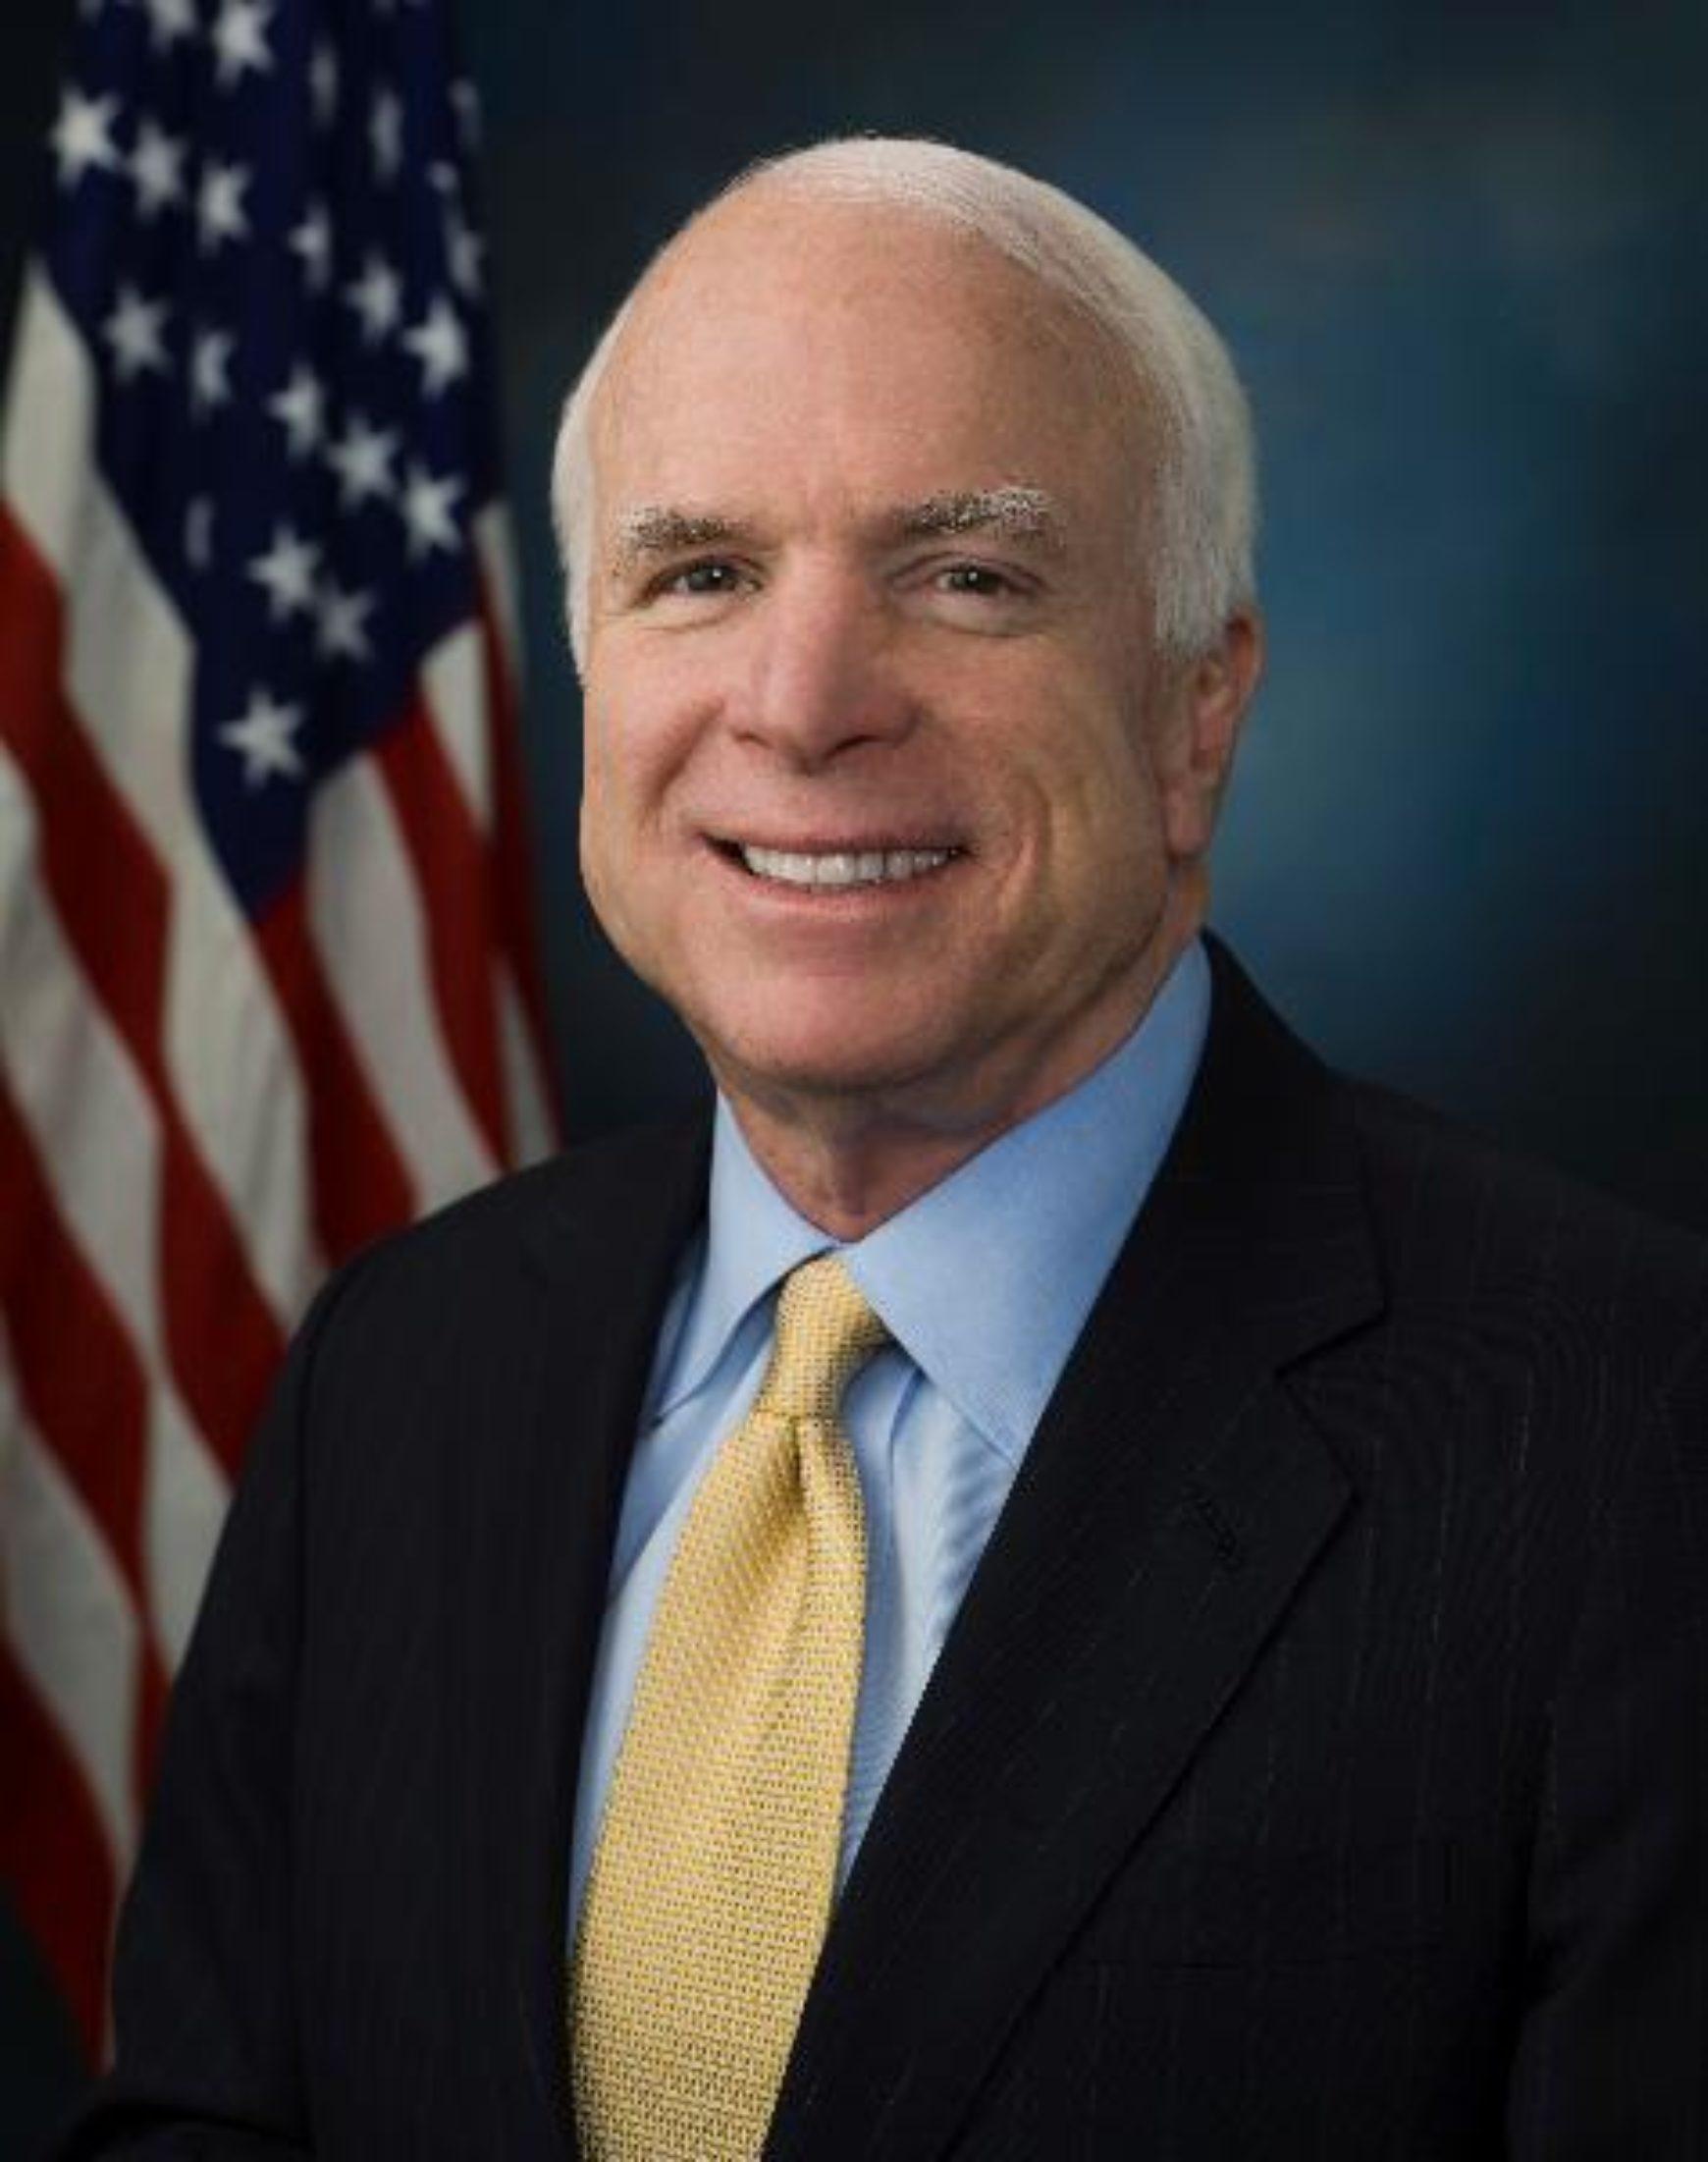 Statement on the Passing of Senator John McCain